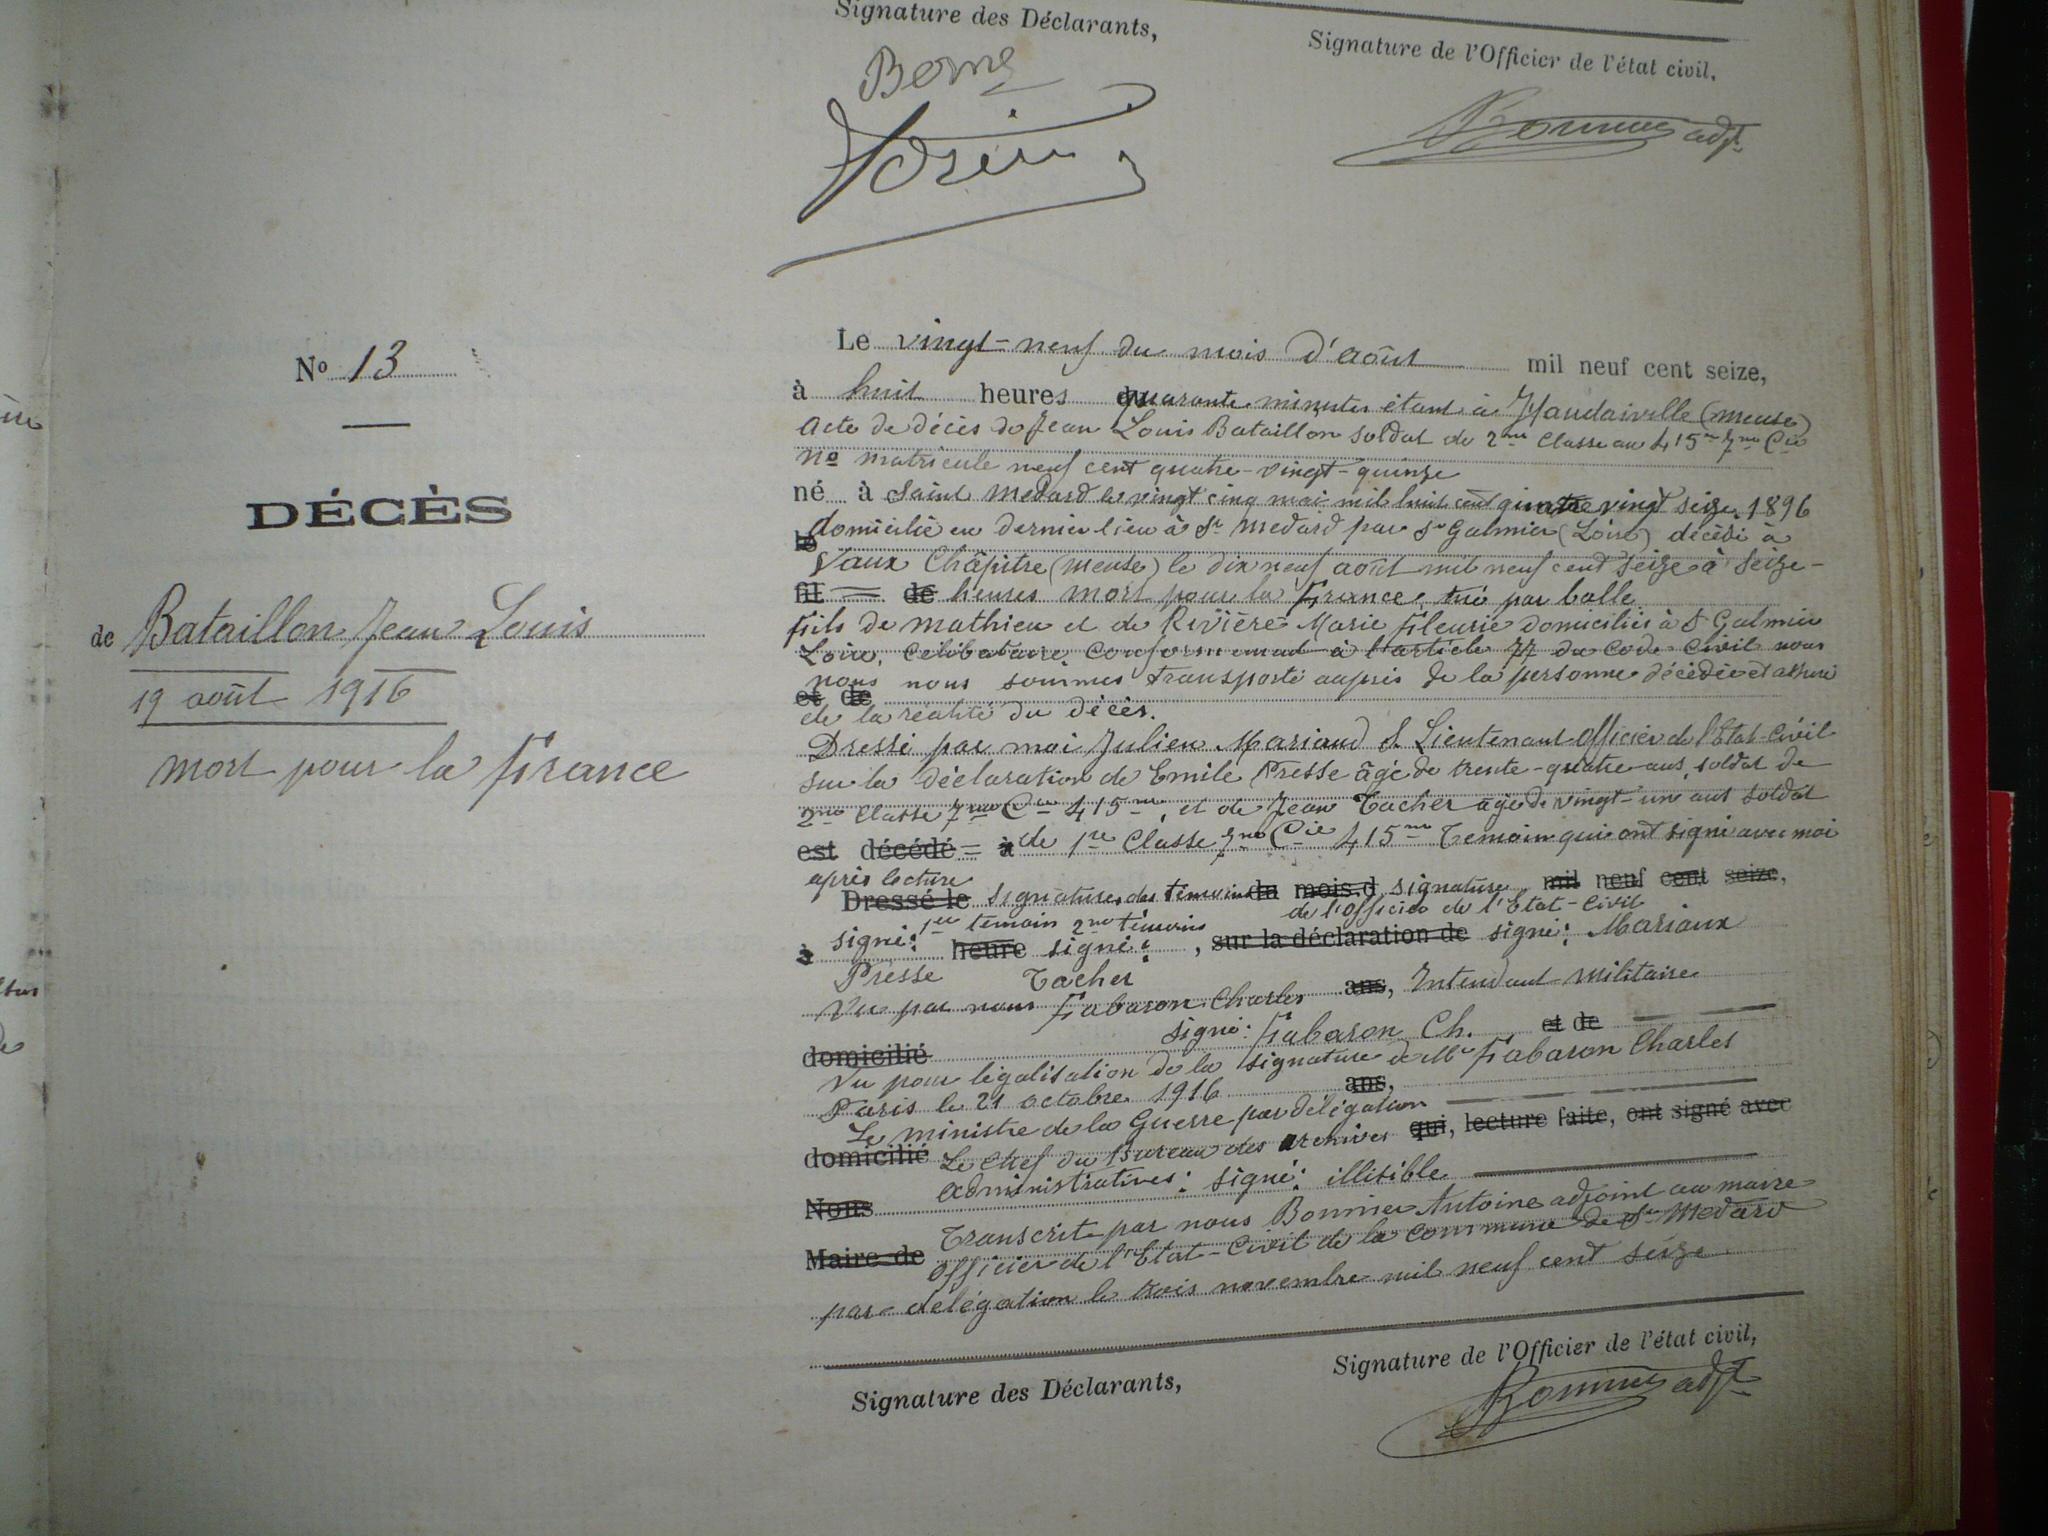 Jean-Louis-Bataillon-19-08-1916.JPG